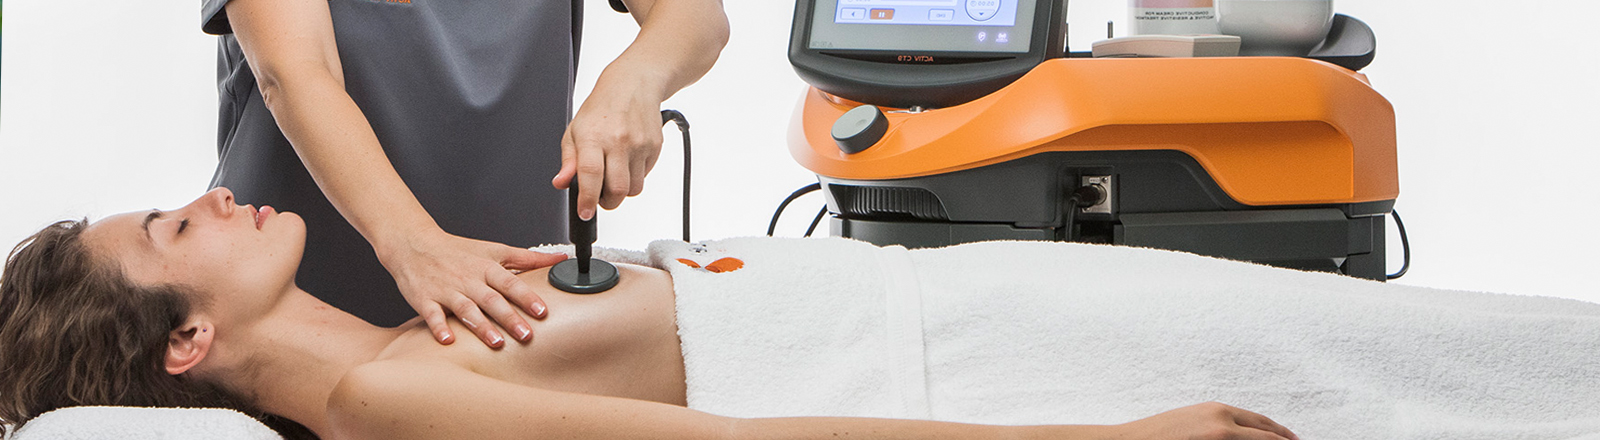 tratamiento uroginecologia fisioclinics bilbao